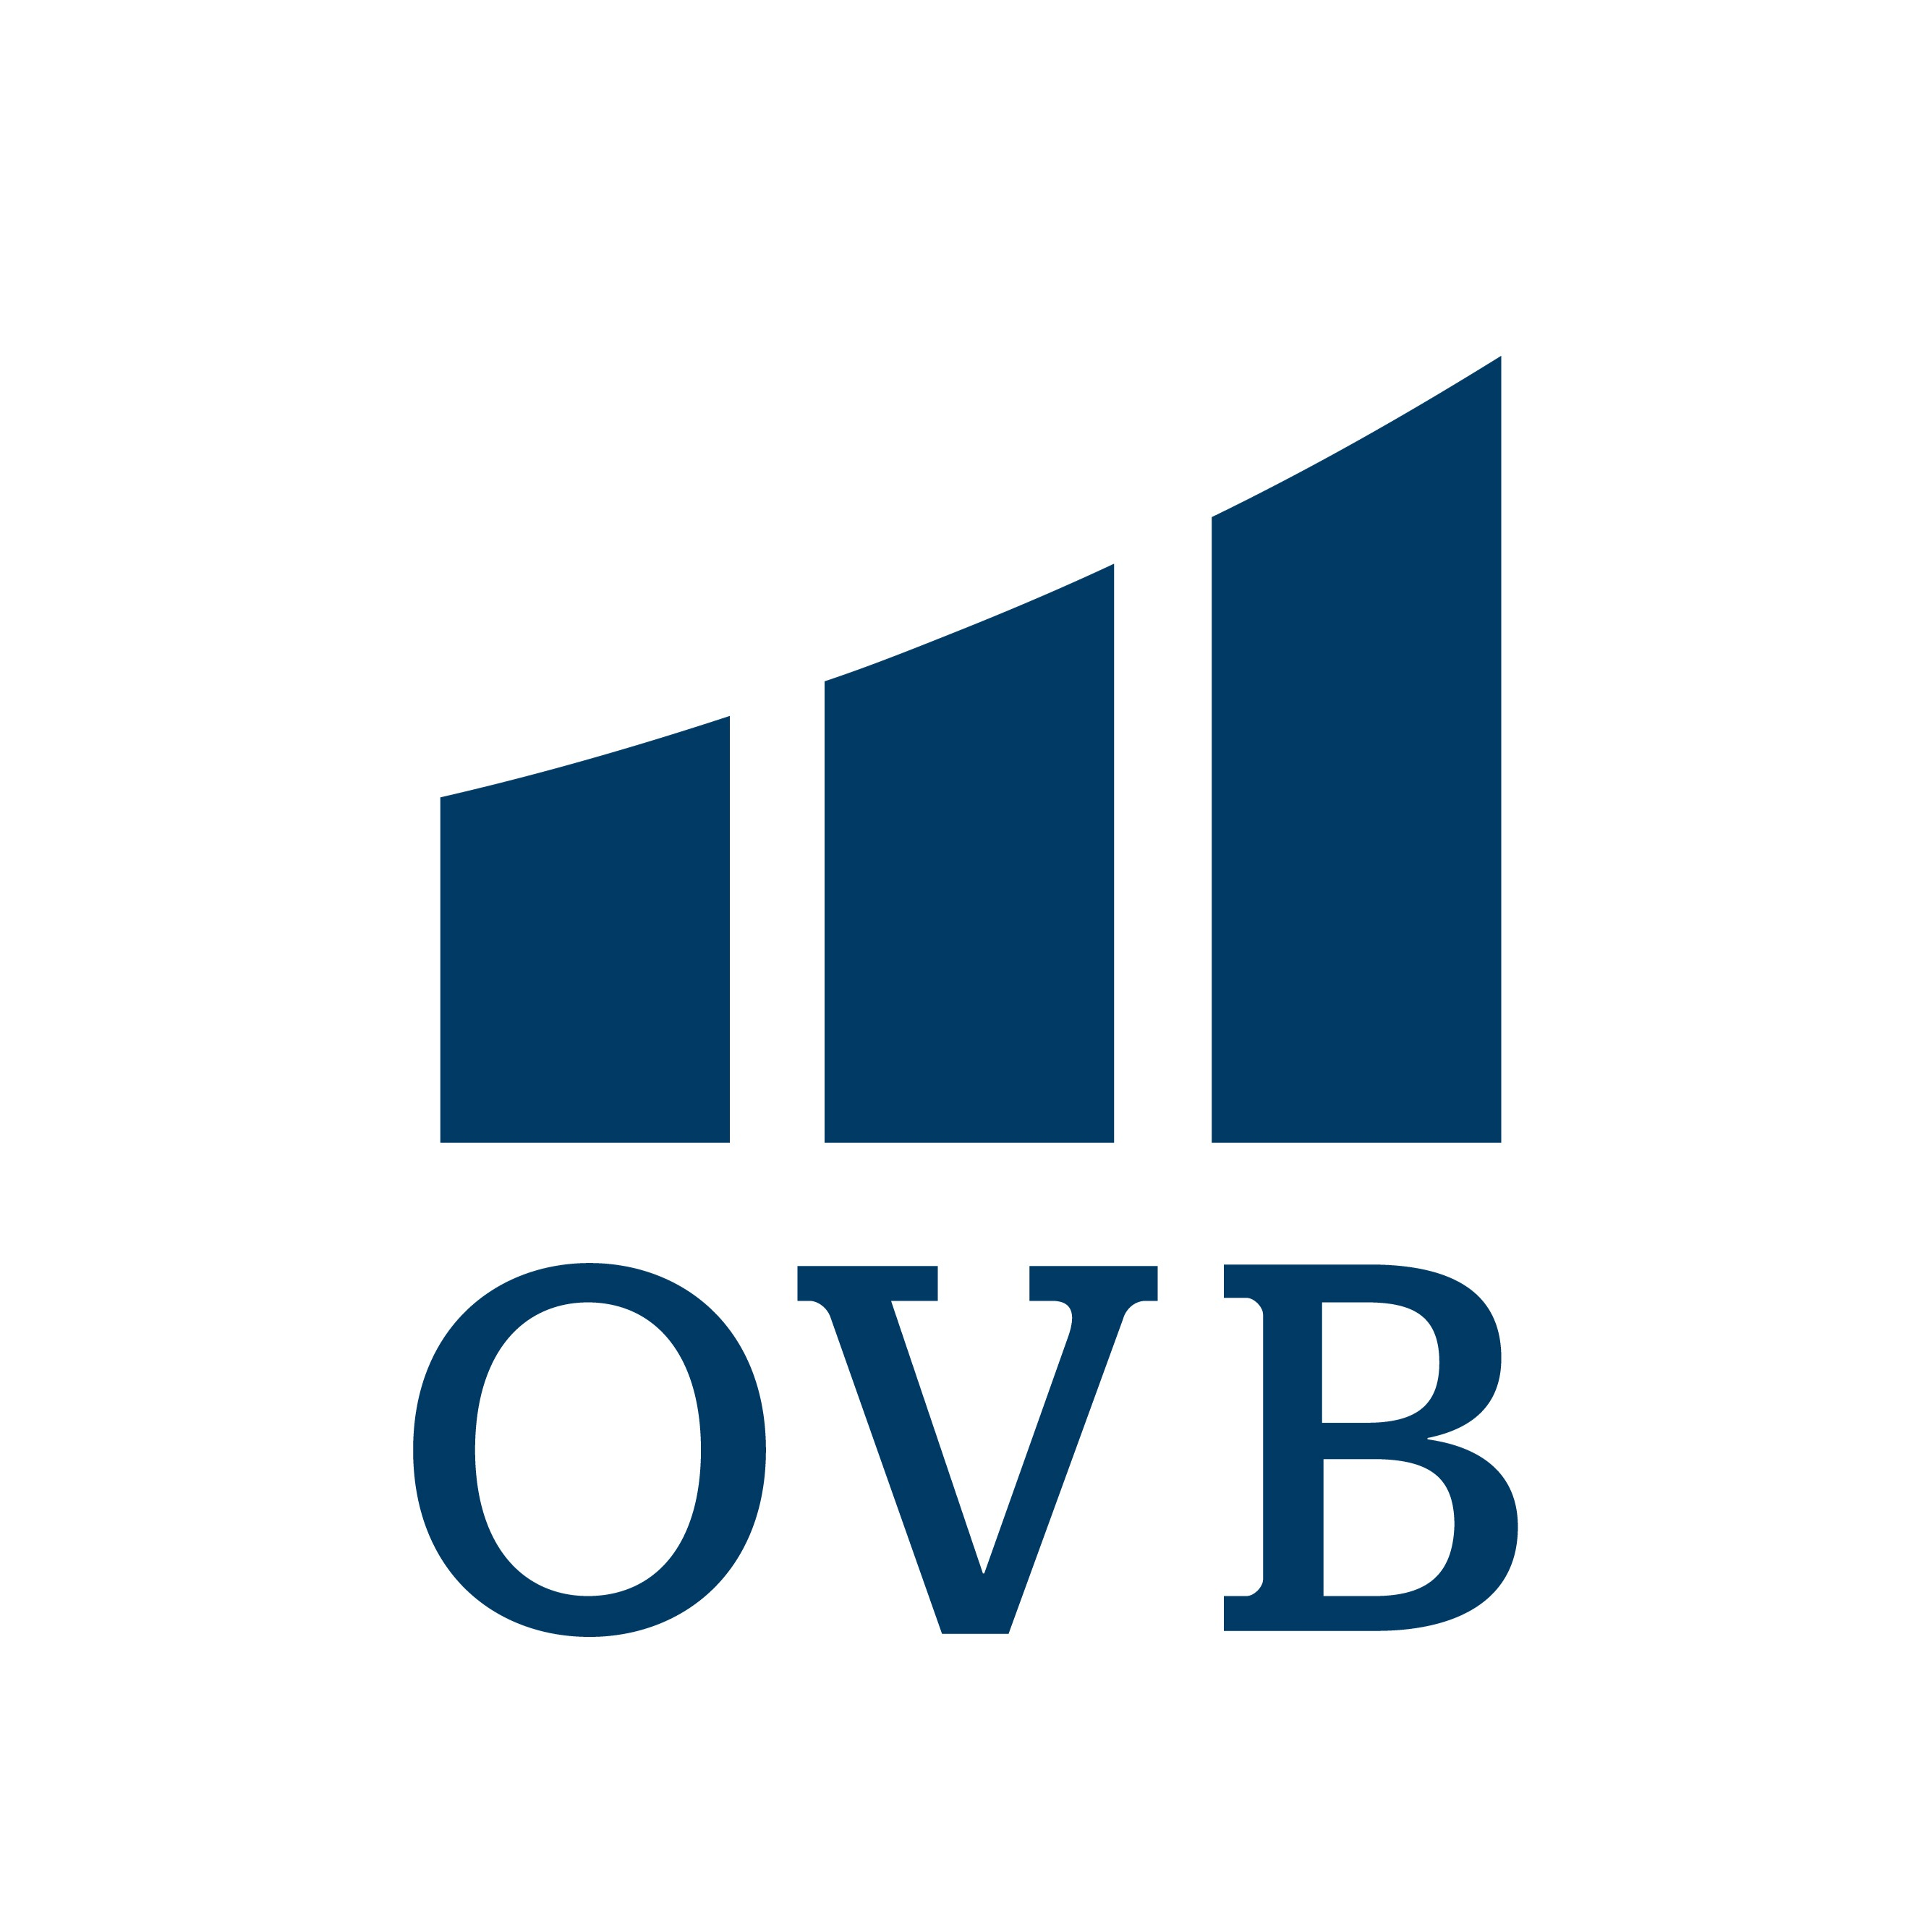 OVB Vermögensberatung AG: Karl-Heinz Schindler